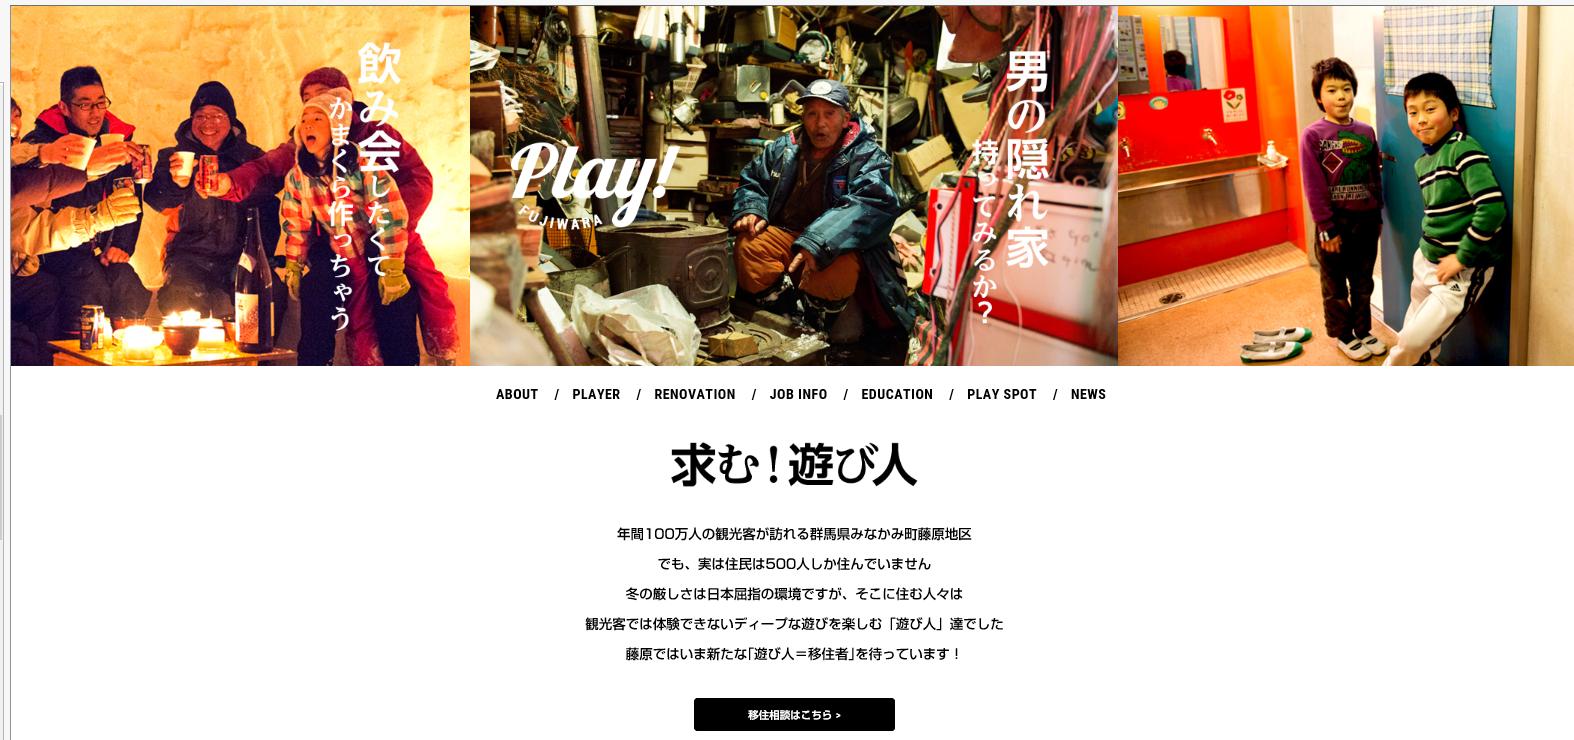 Play Fujiwara